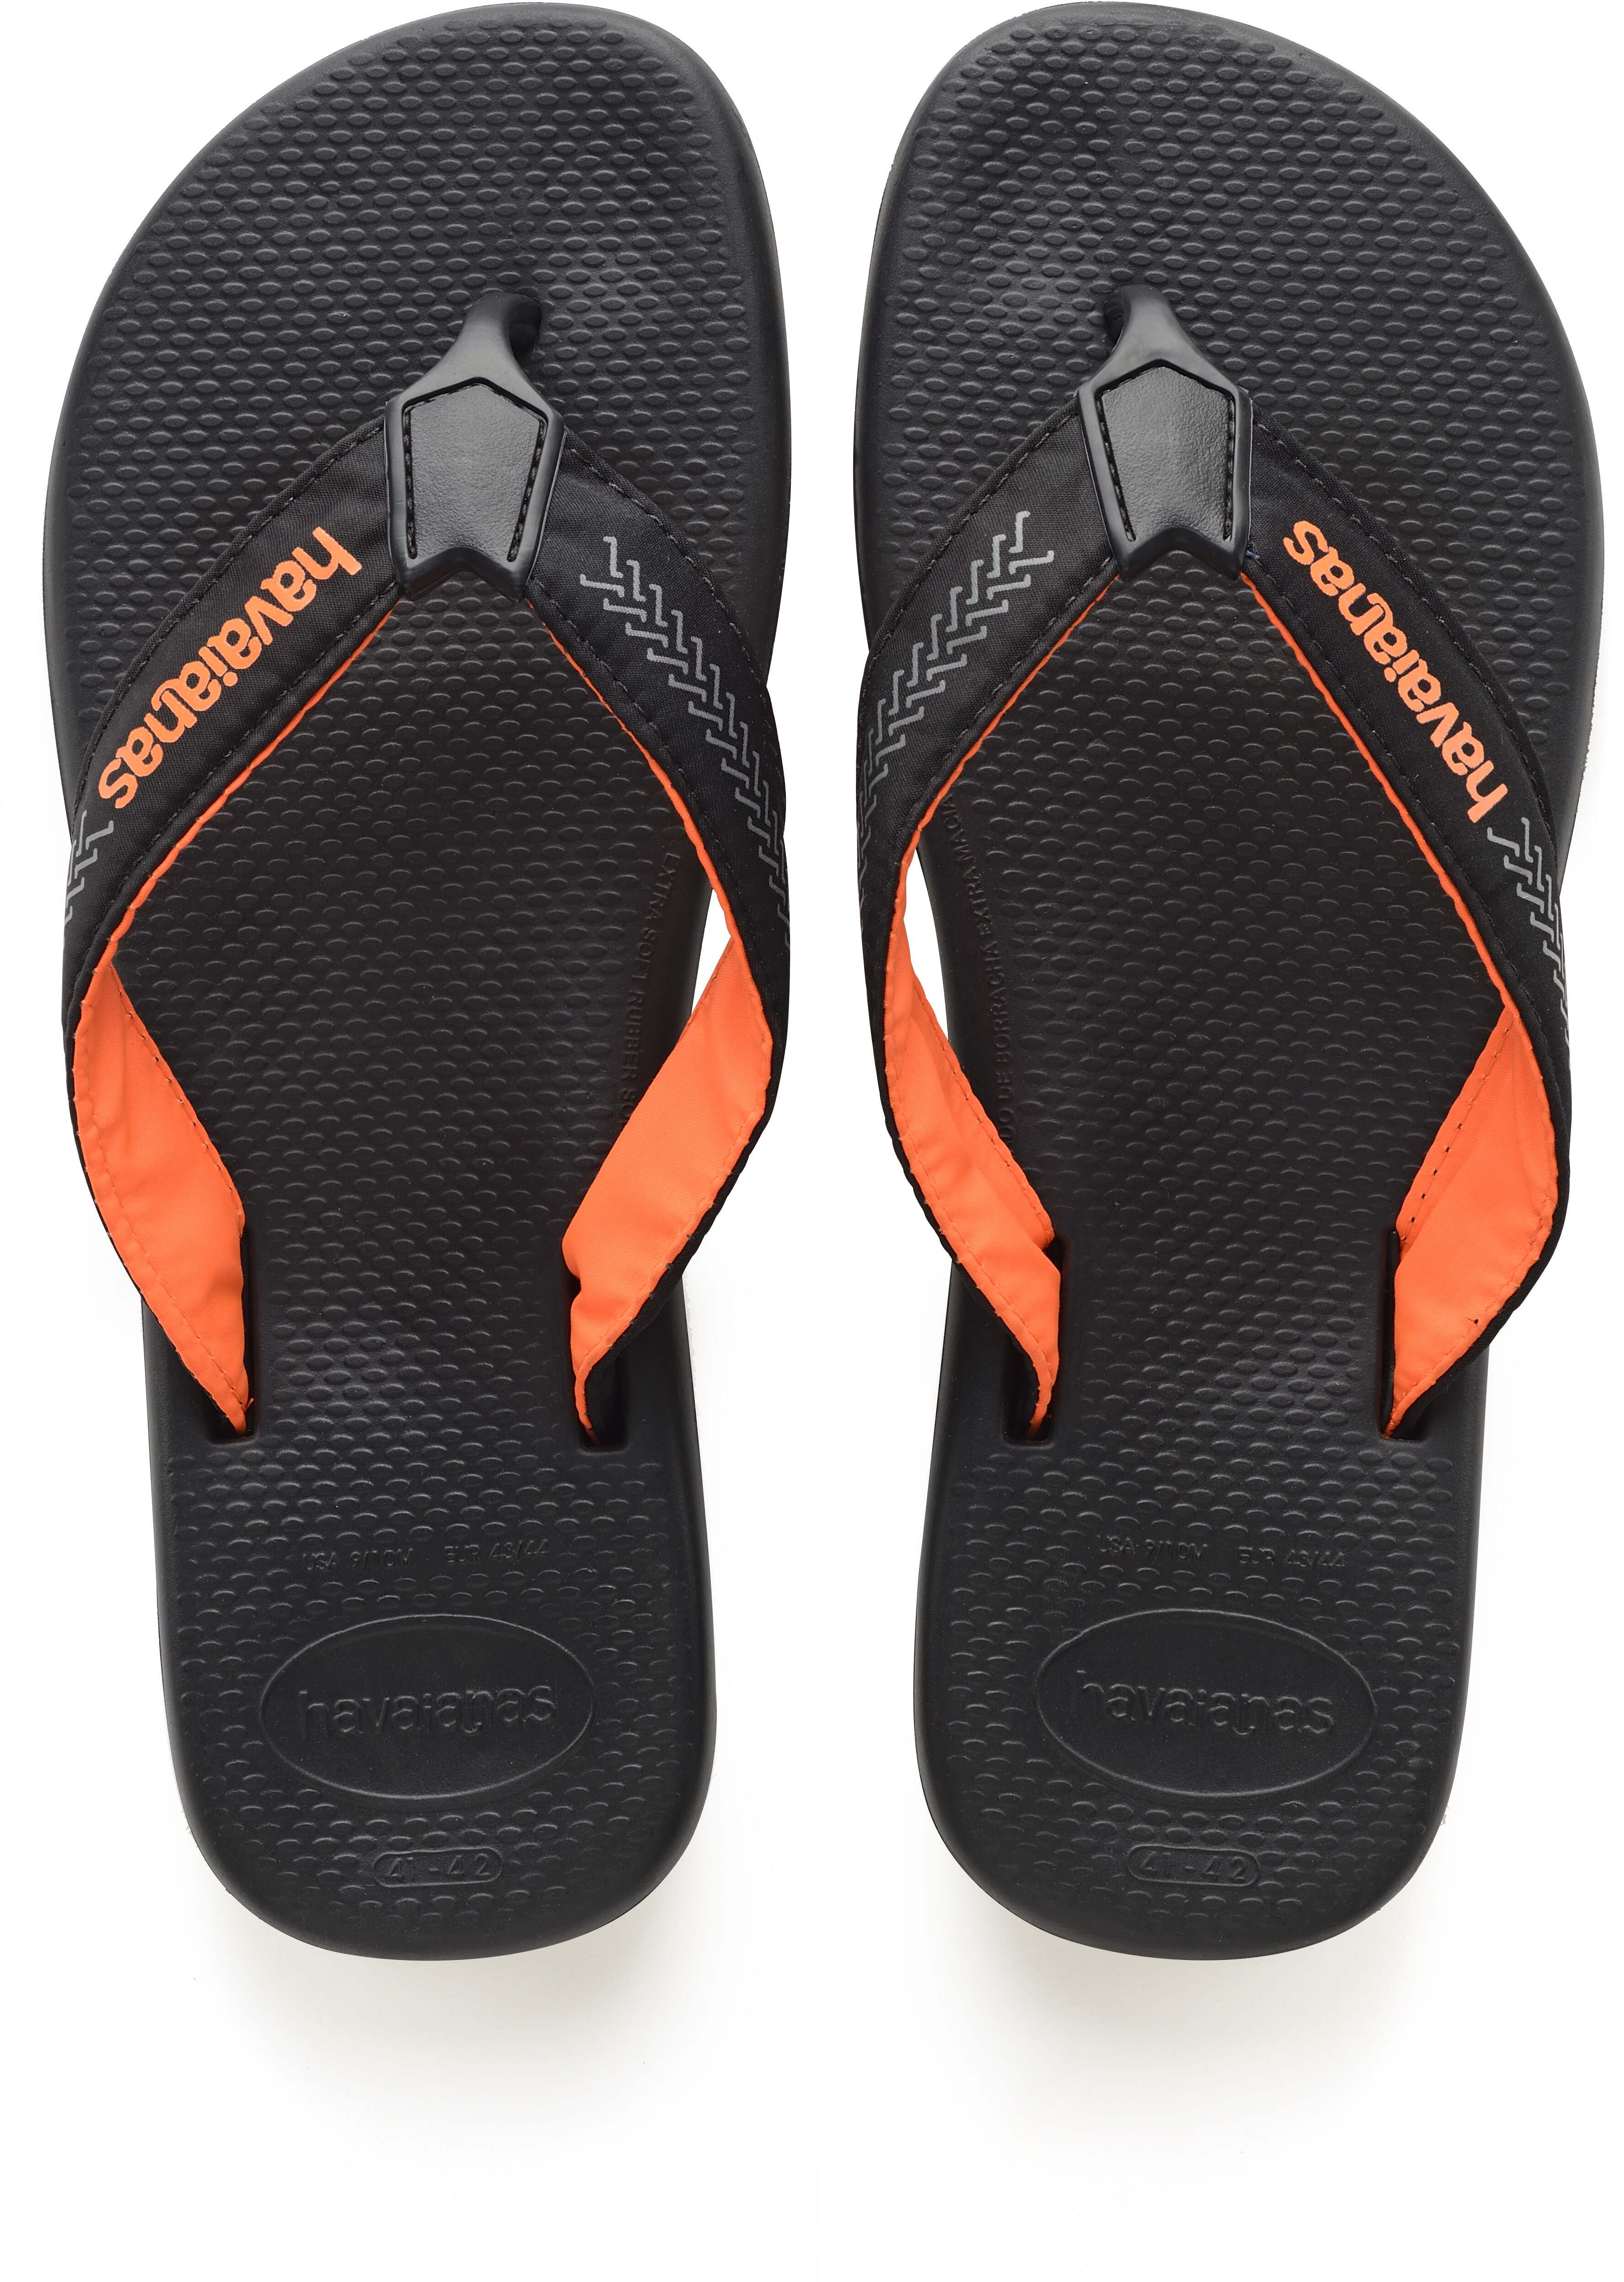 5b04ca42f268 havaianas Surf Pro Sandals Men black at Addnature.co.uk